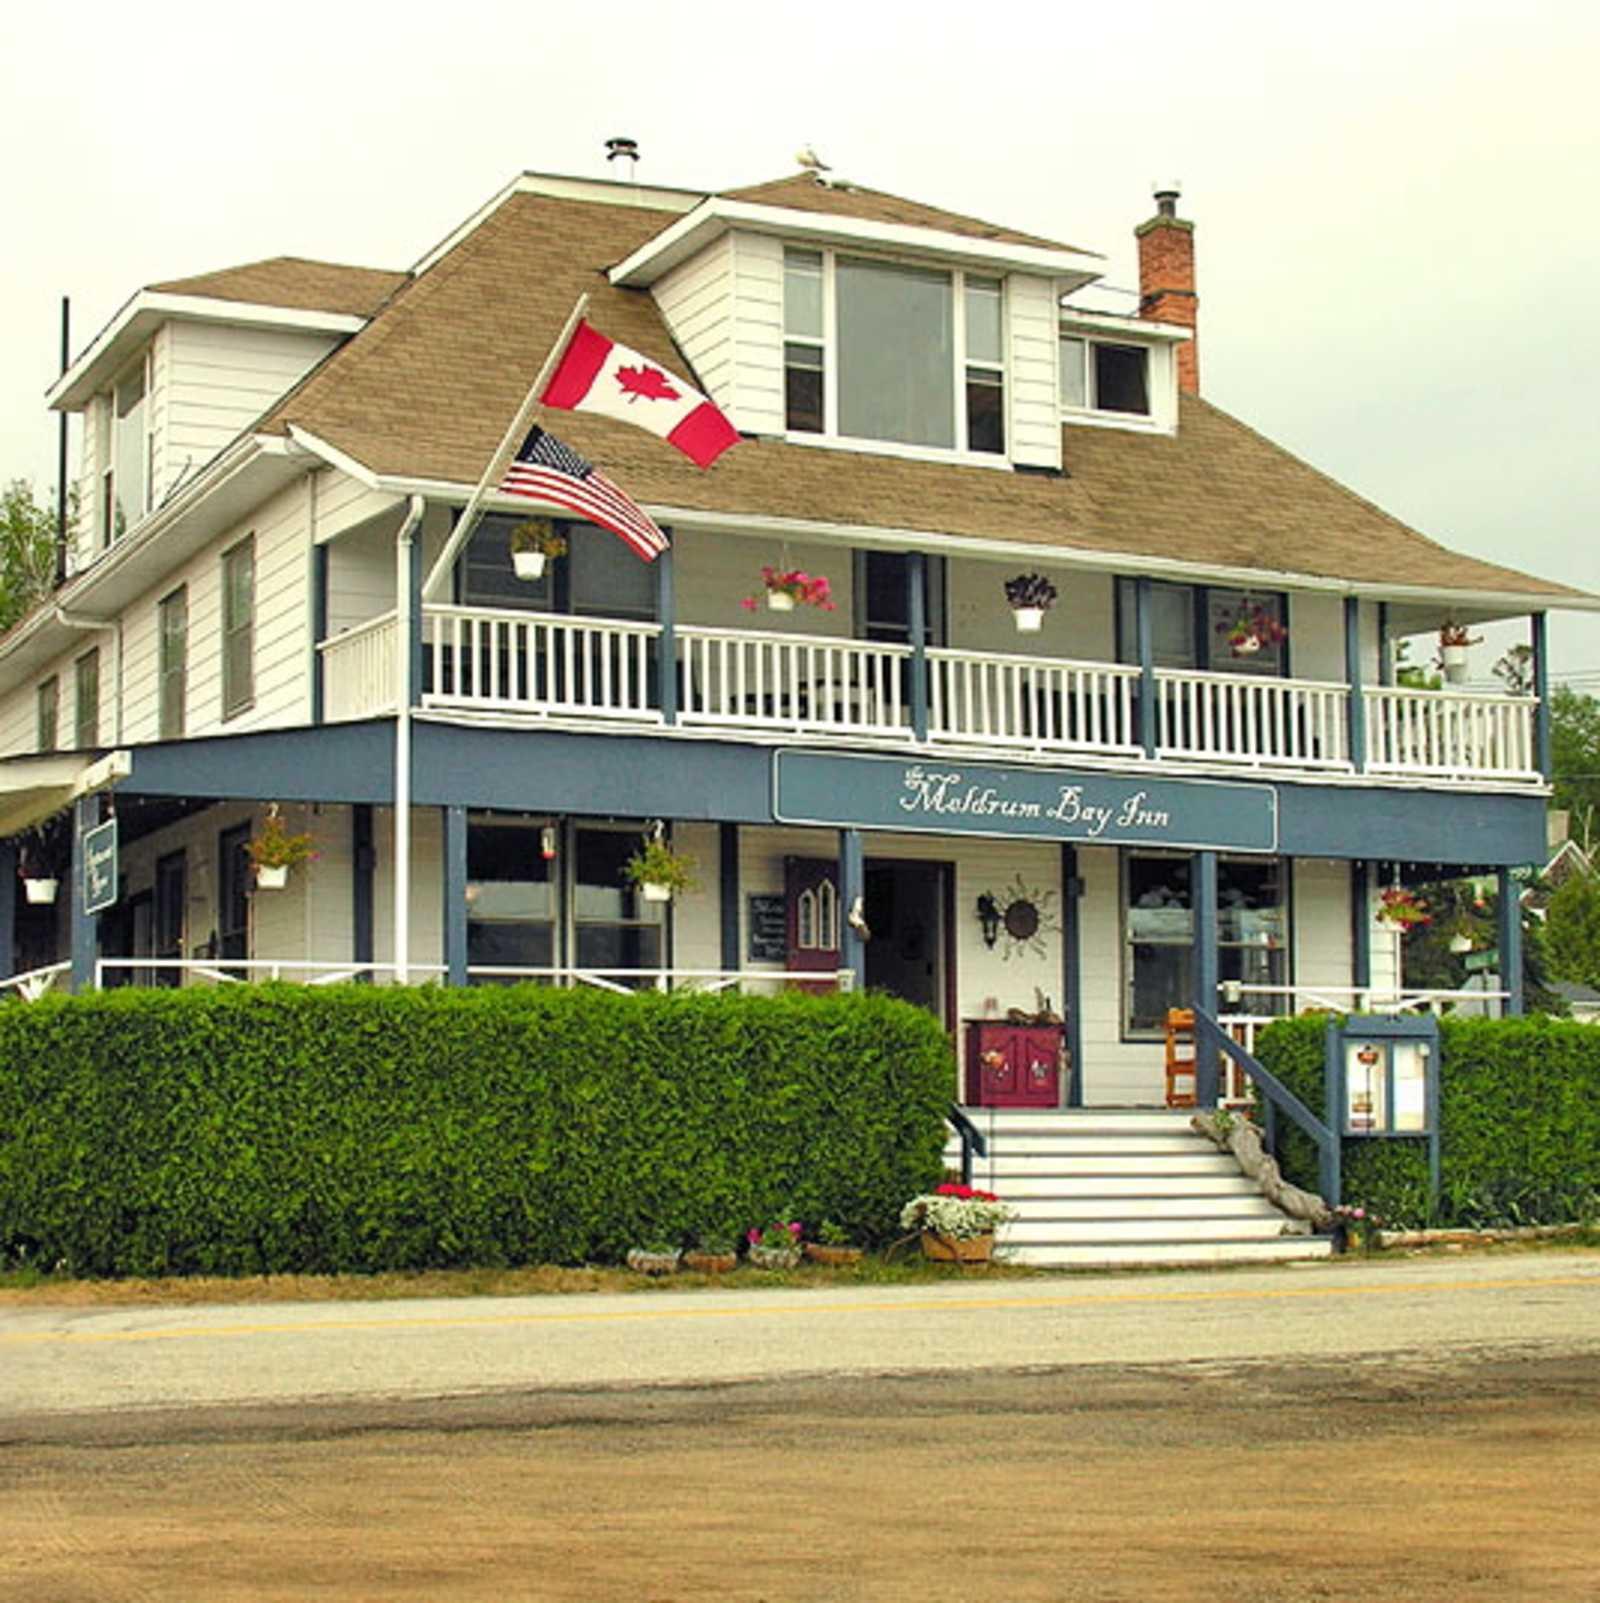 The Meldrum Bay Inn